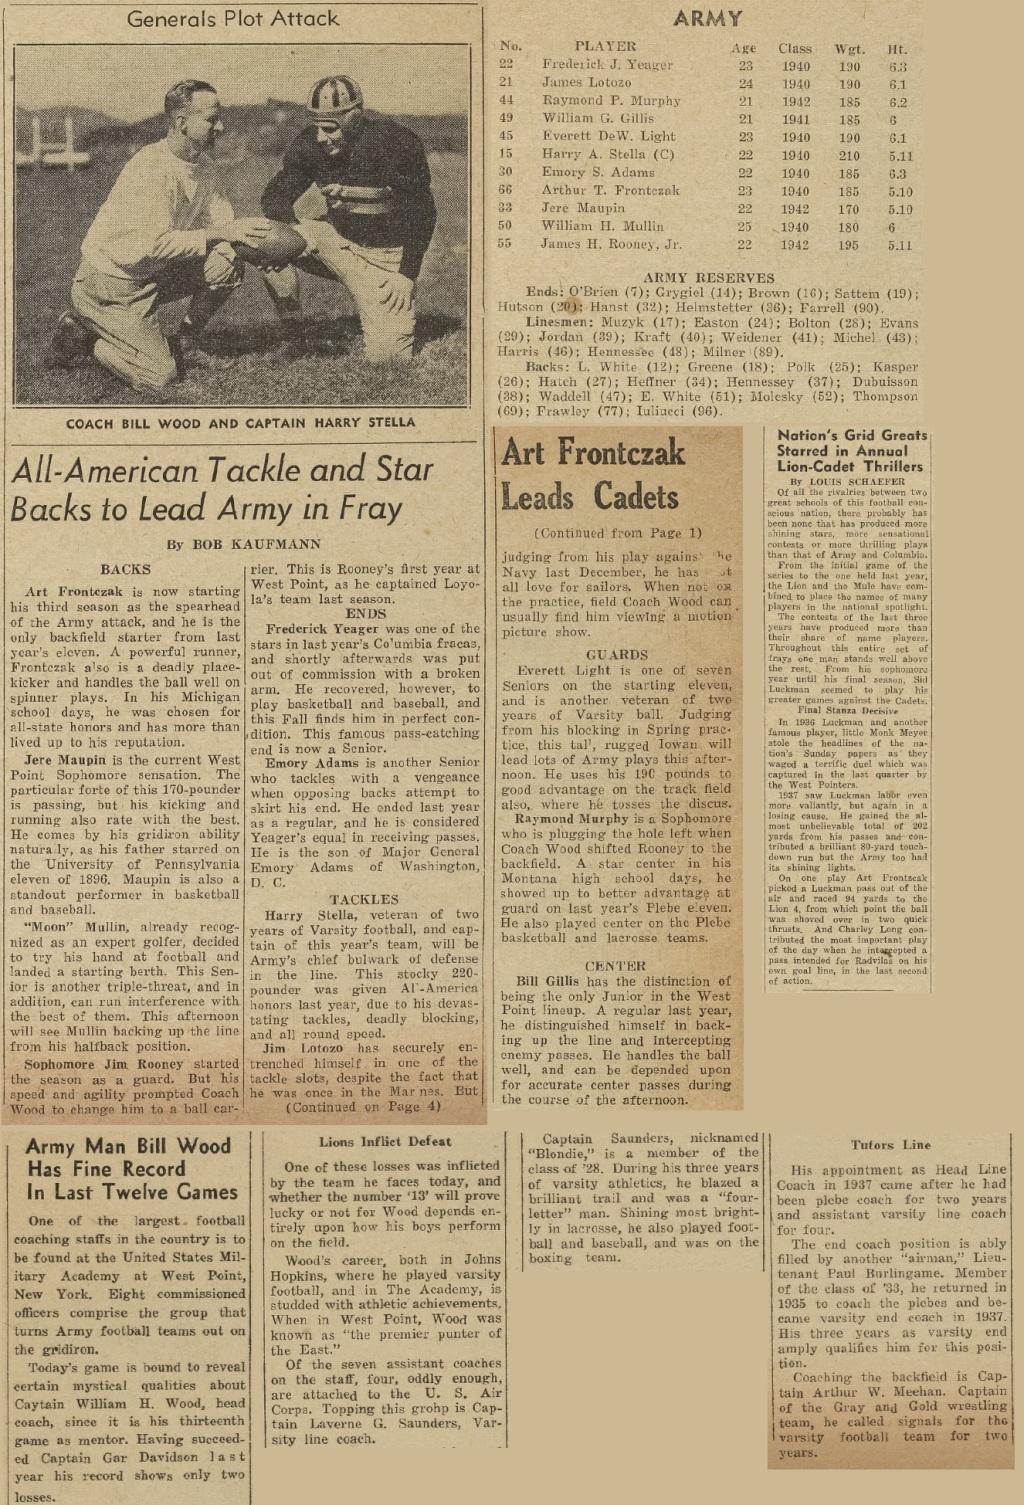 ArmyFB_1939_vsColumbia_ColumbiaSpectator_Oct141939